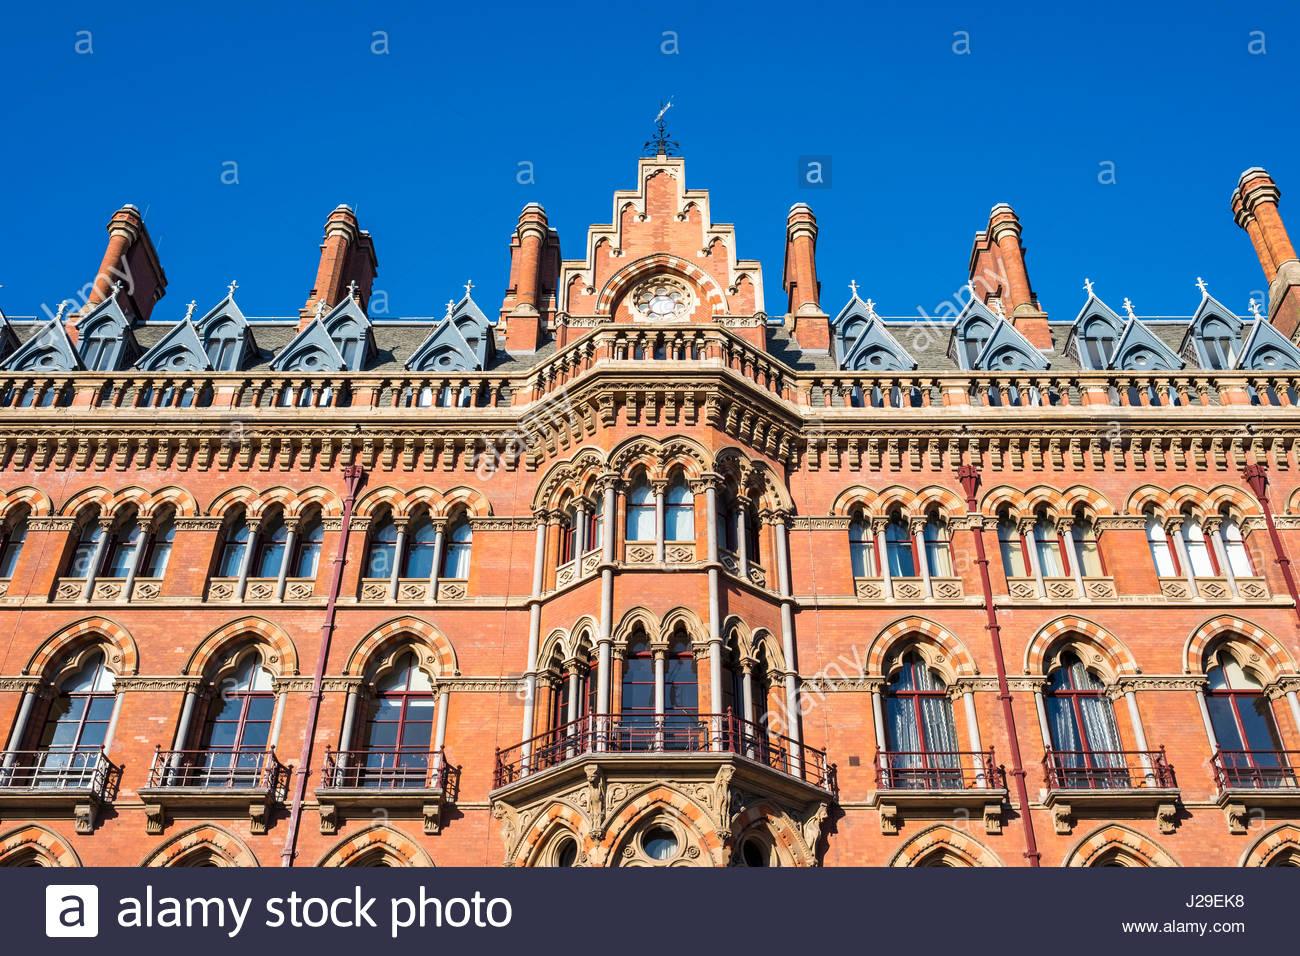 United Kingdom, England, London. St Pancras International railway station. - Stock Image